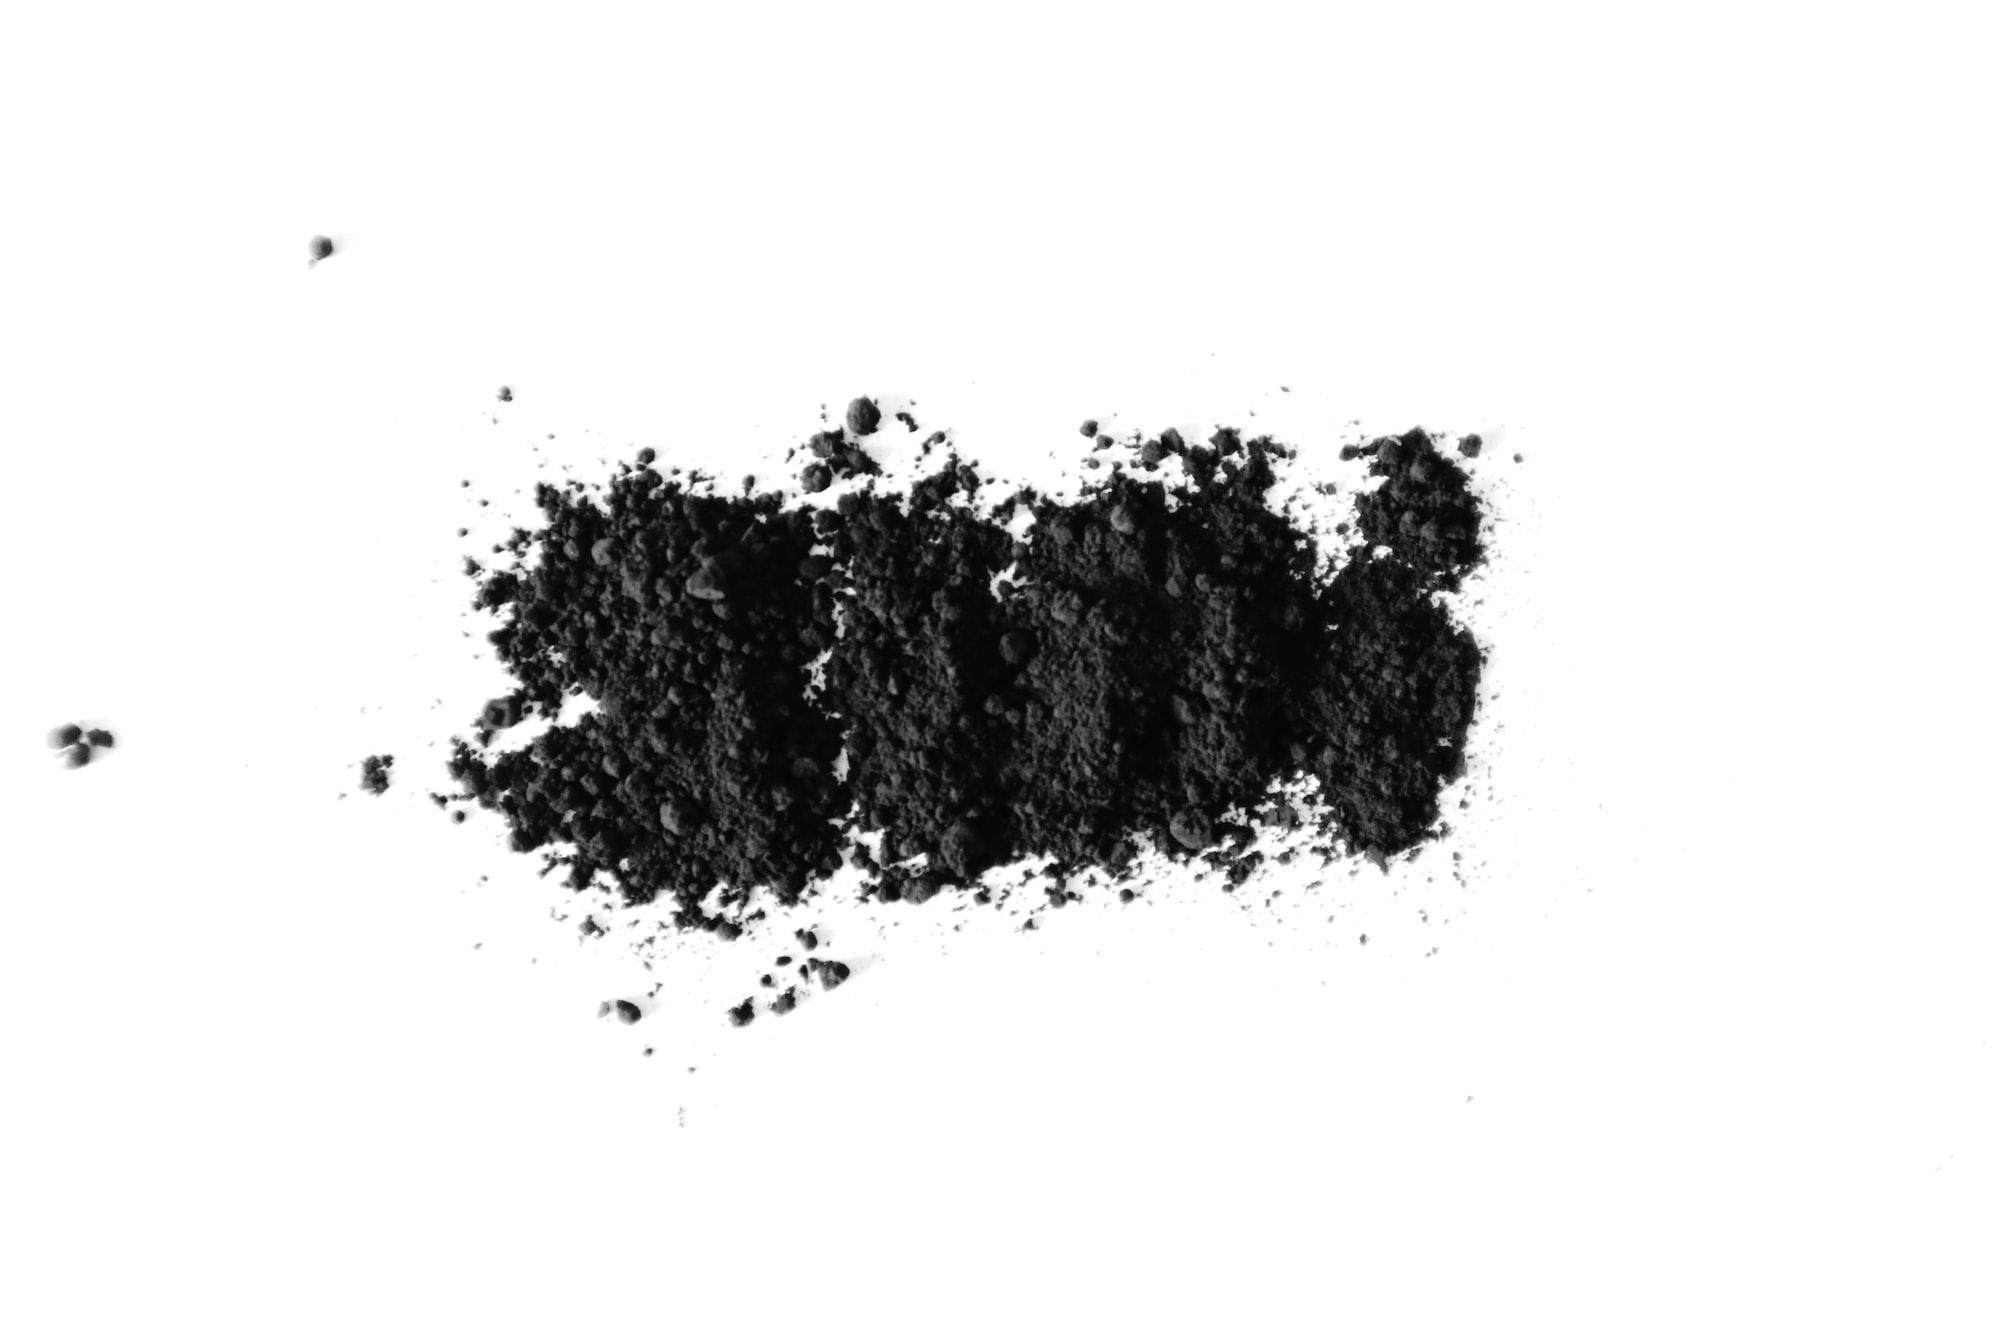 Ash Wednesday, Dust, and Digital Ephemera